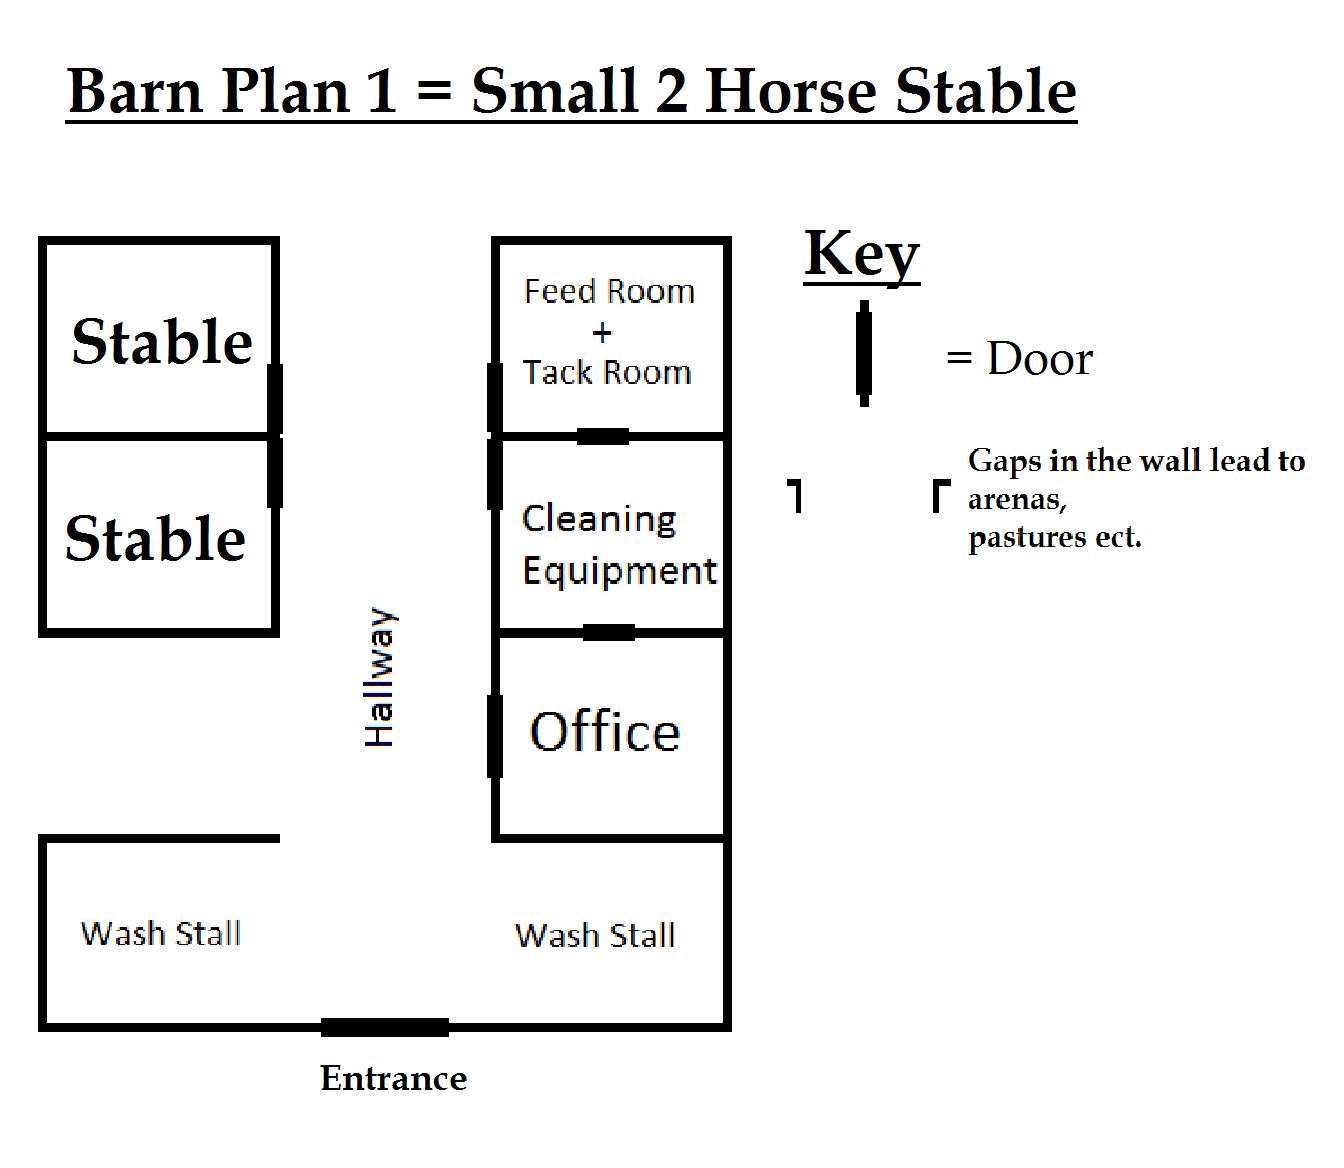 Barn Plan - Small 2 Horse Stable by wolfdemondstar on DeviantArt